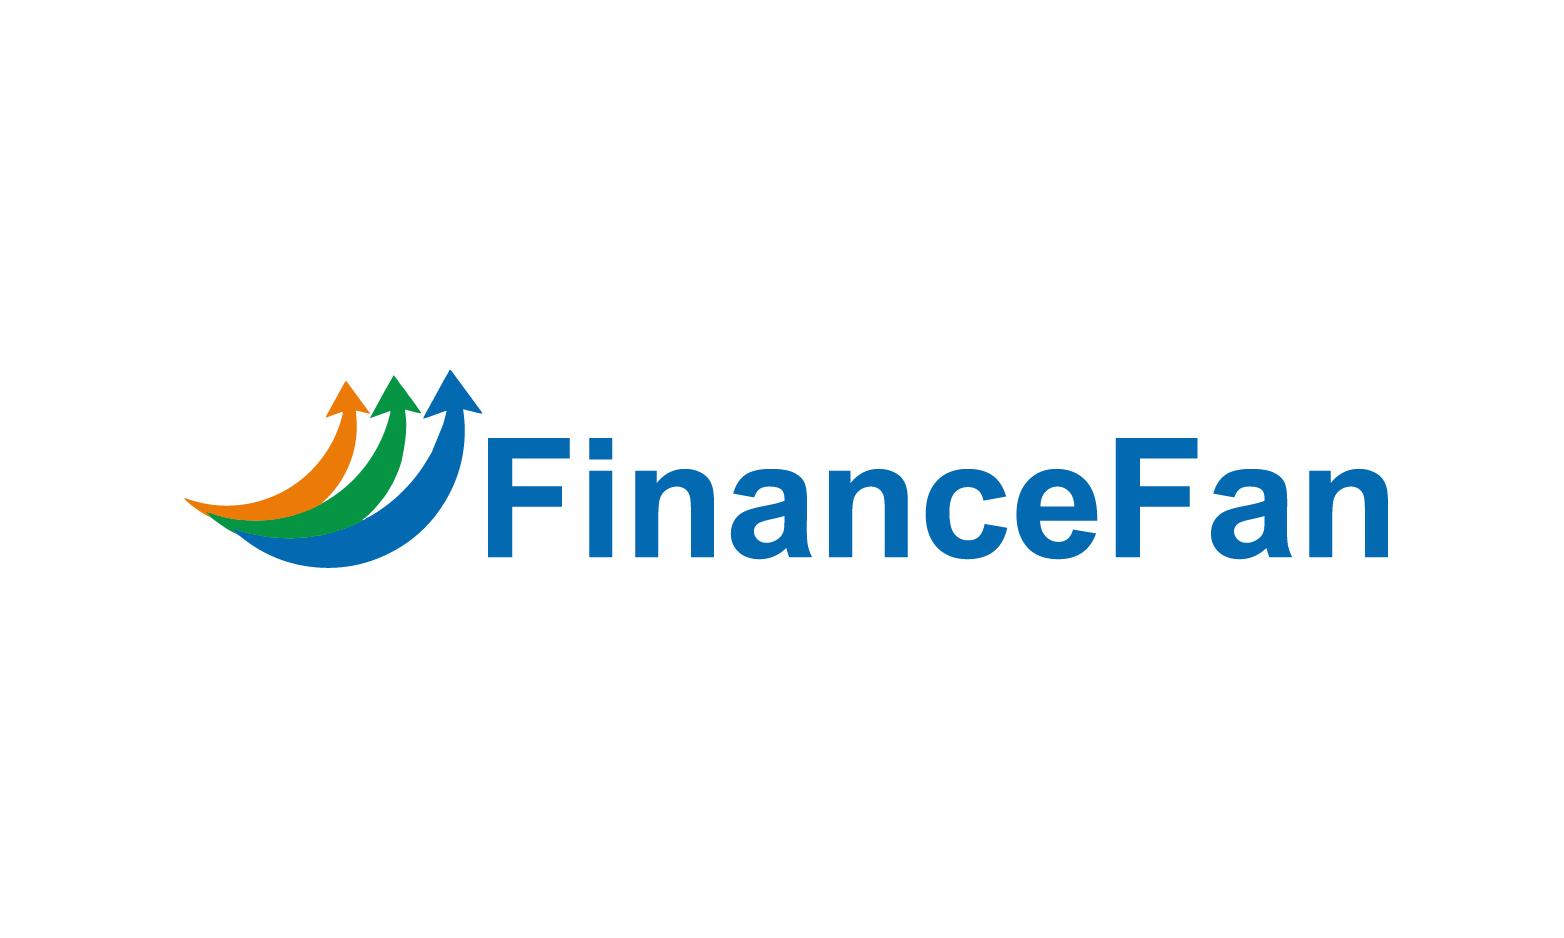 FinanceFan.com